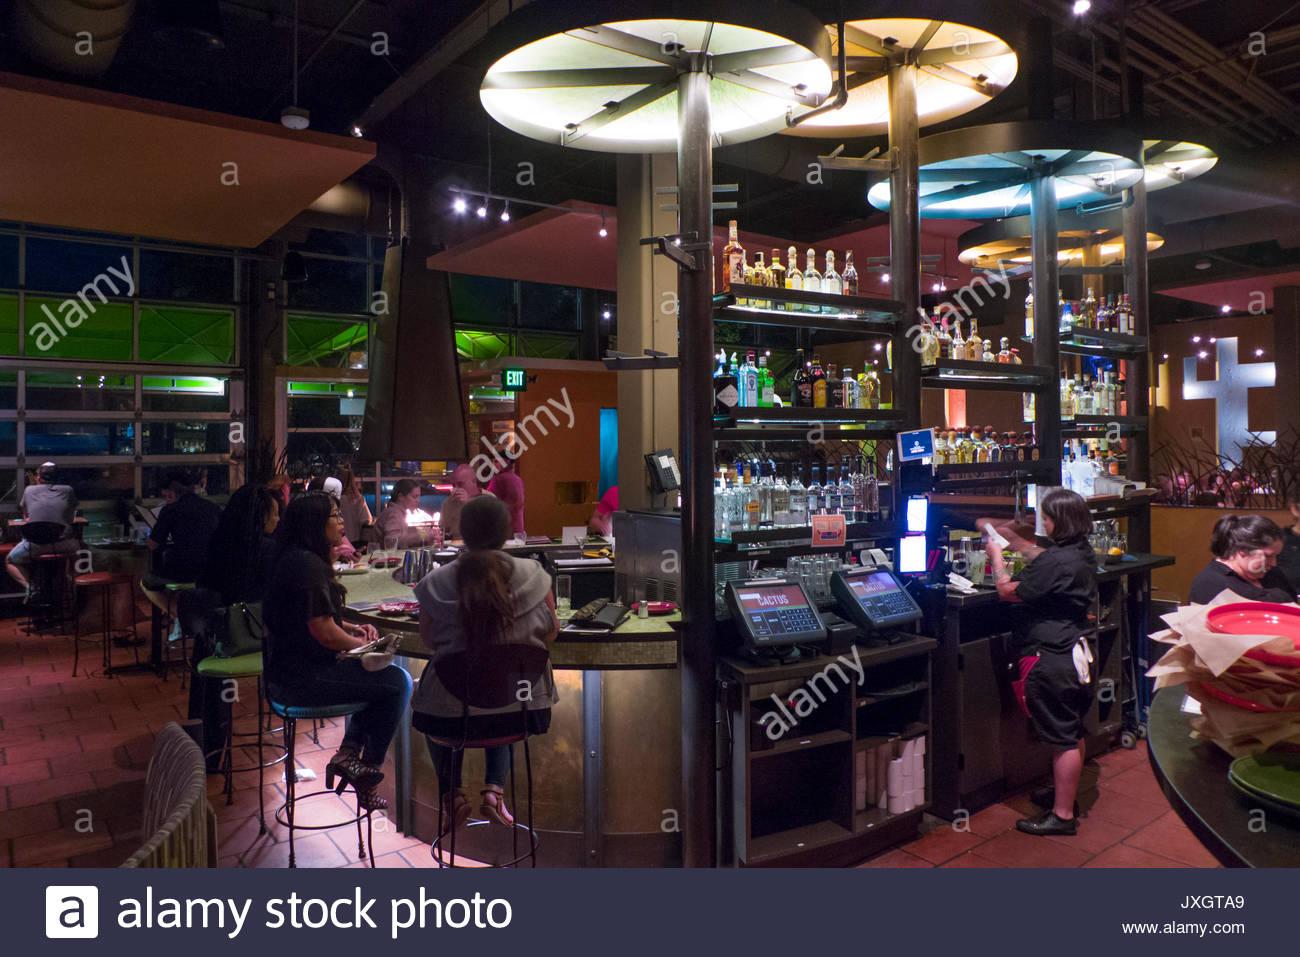 Patrons Dining Inside Cactus Alki Beach Restaurant Alki Seattle